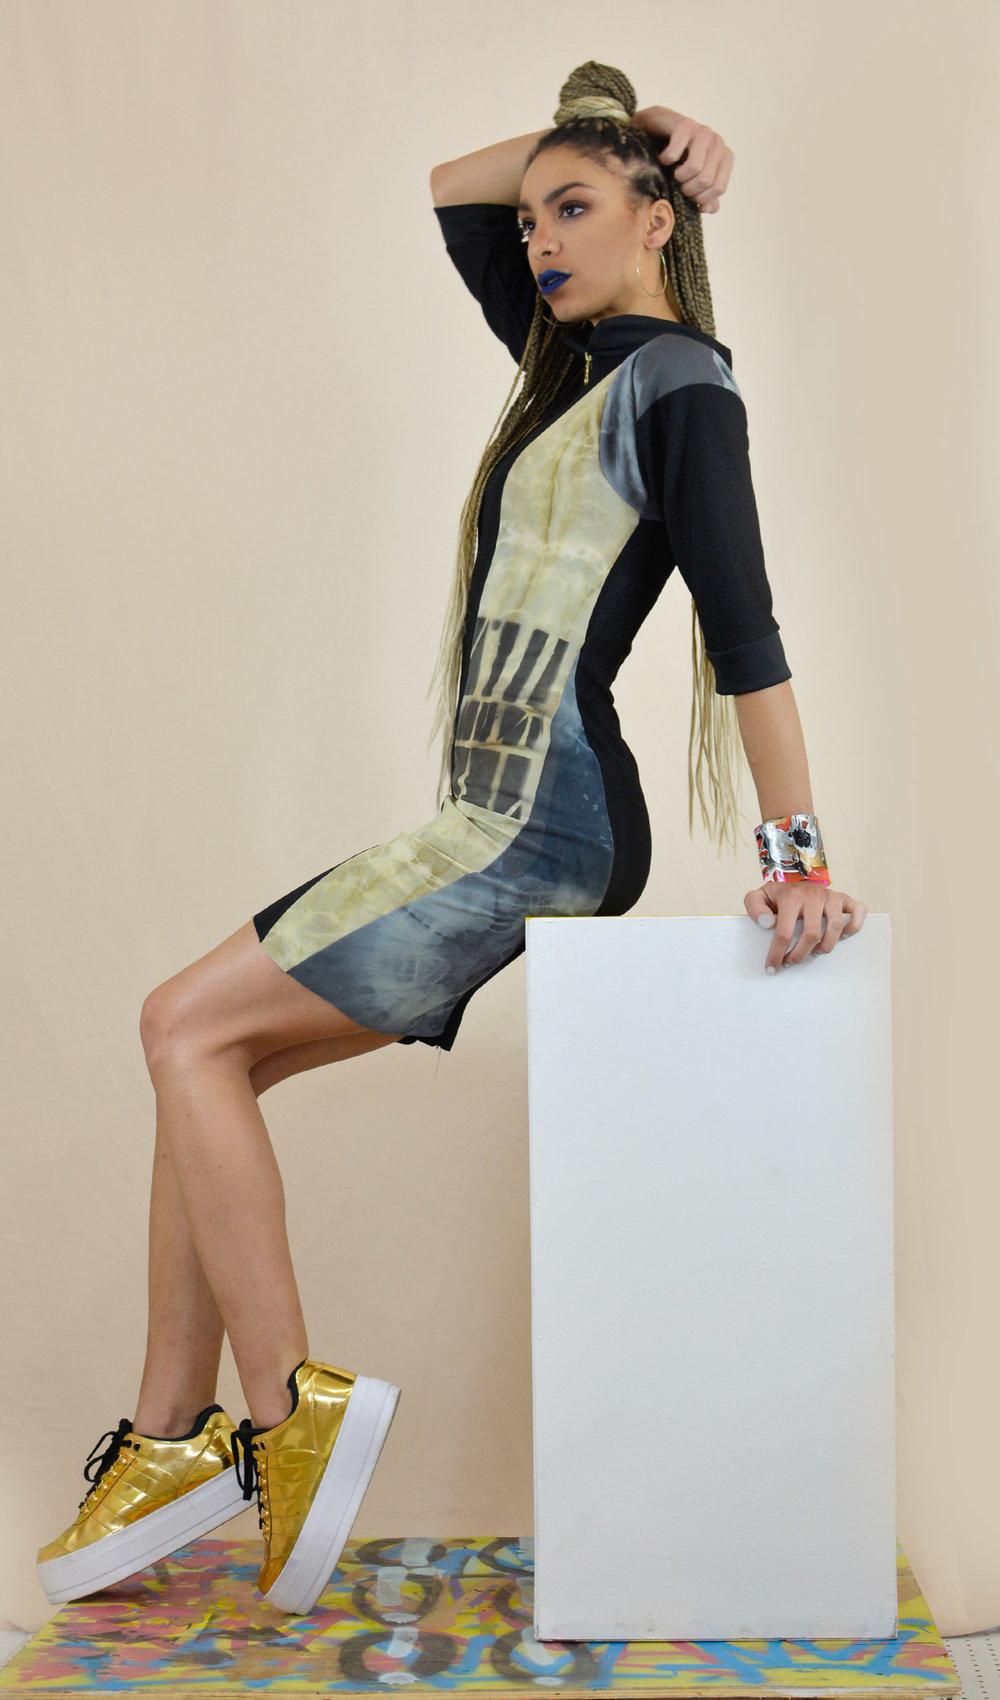 WM x Rightfully Sewn Bodycon Dress by Whitney Manney